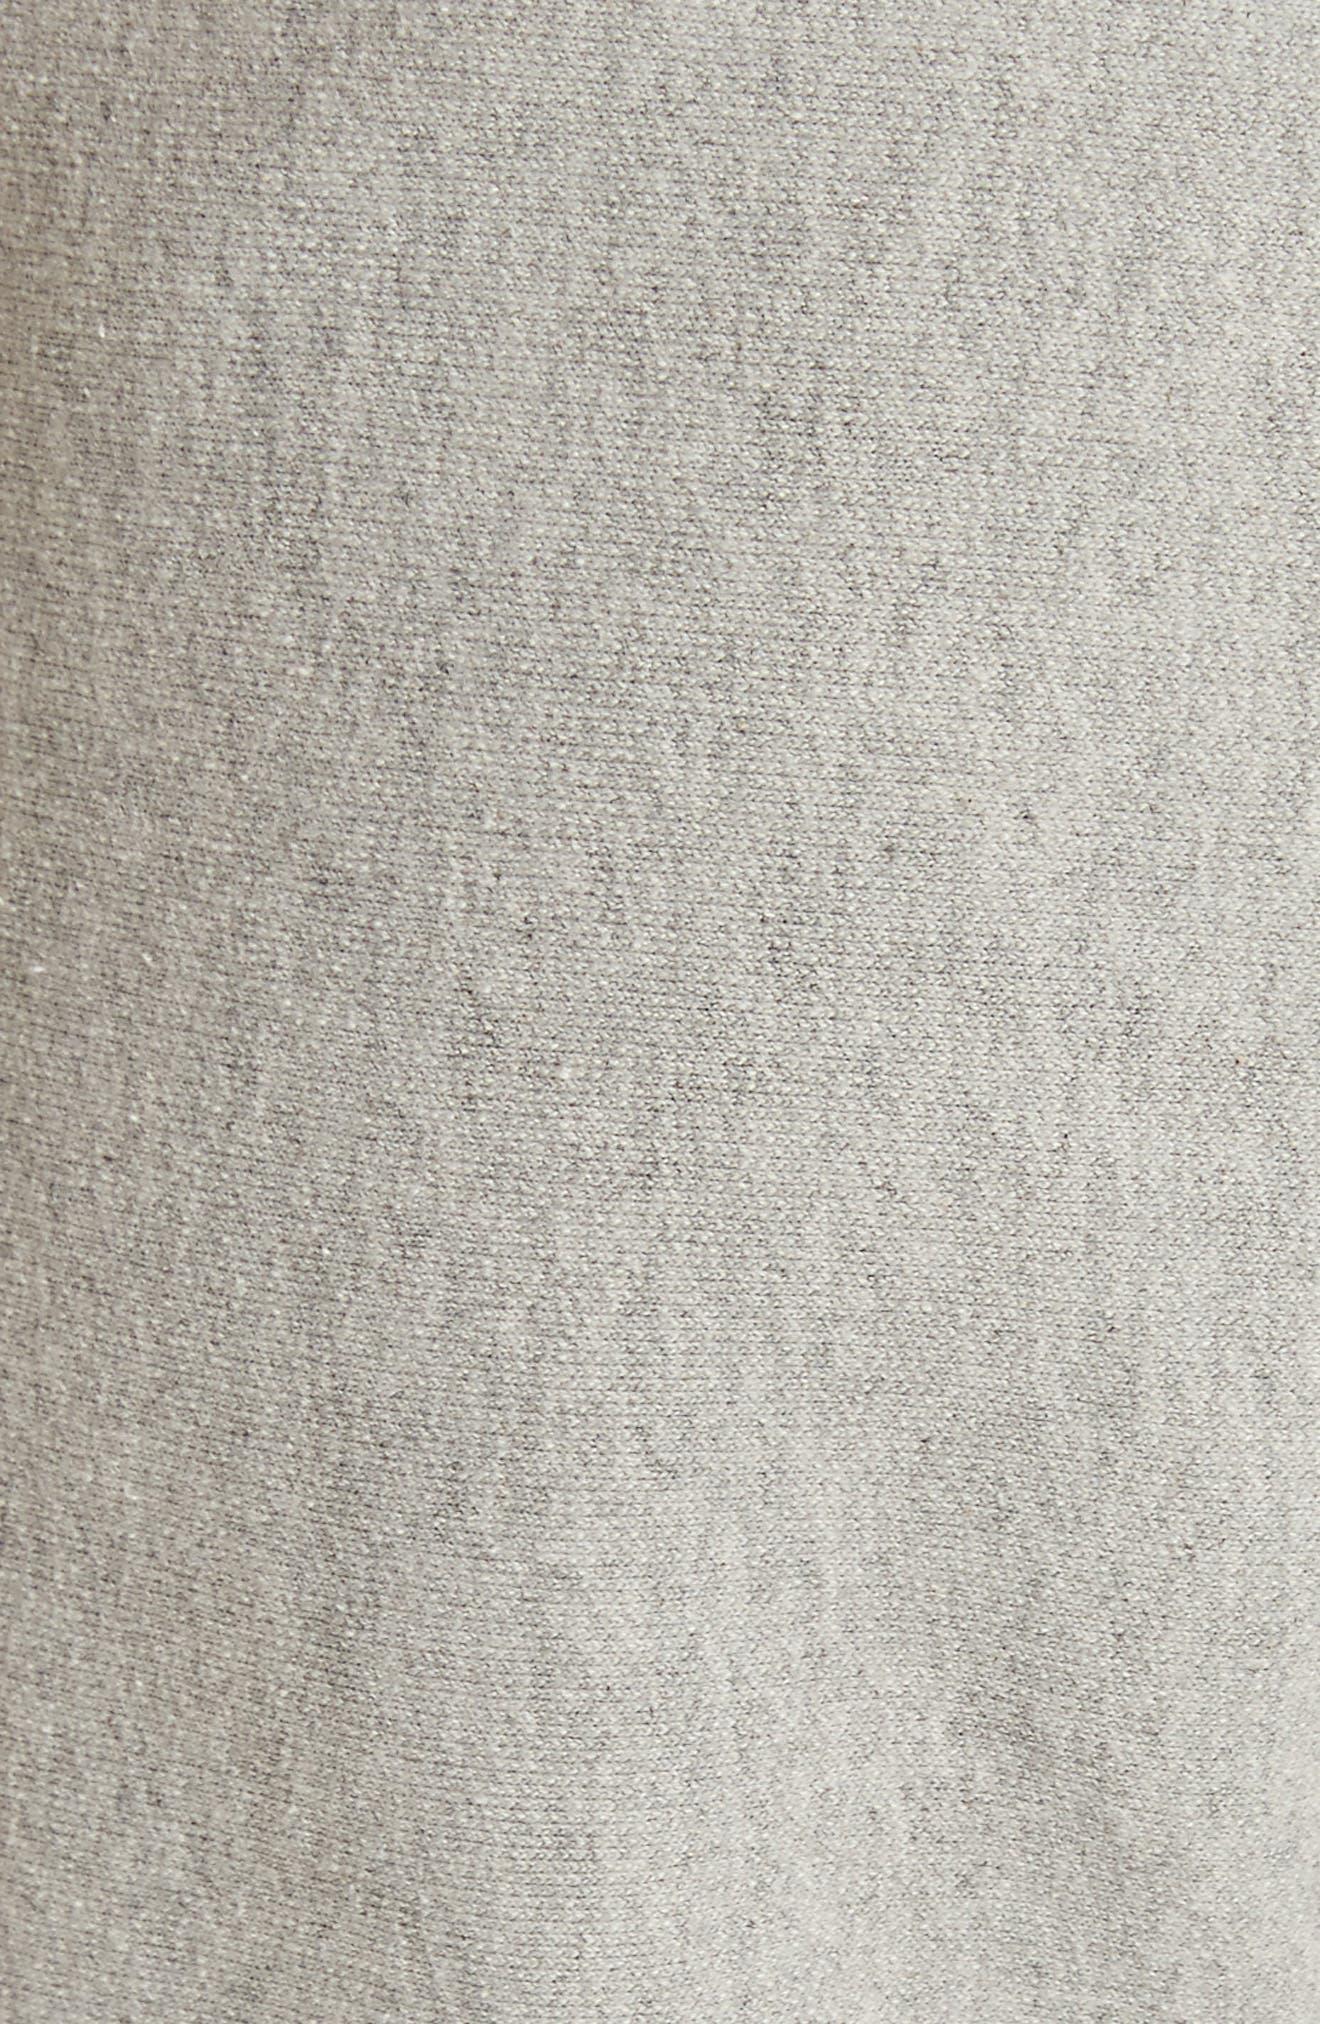 + Champion Sweatpants,                             Alternate thumbnail 5, color,                             069